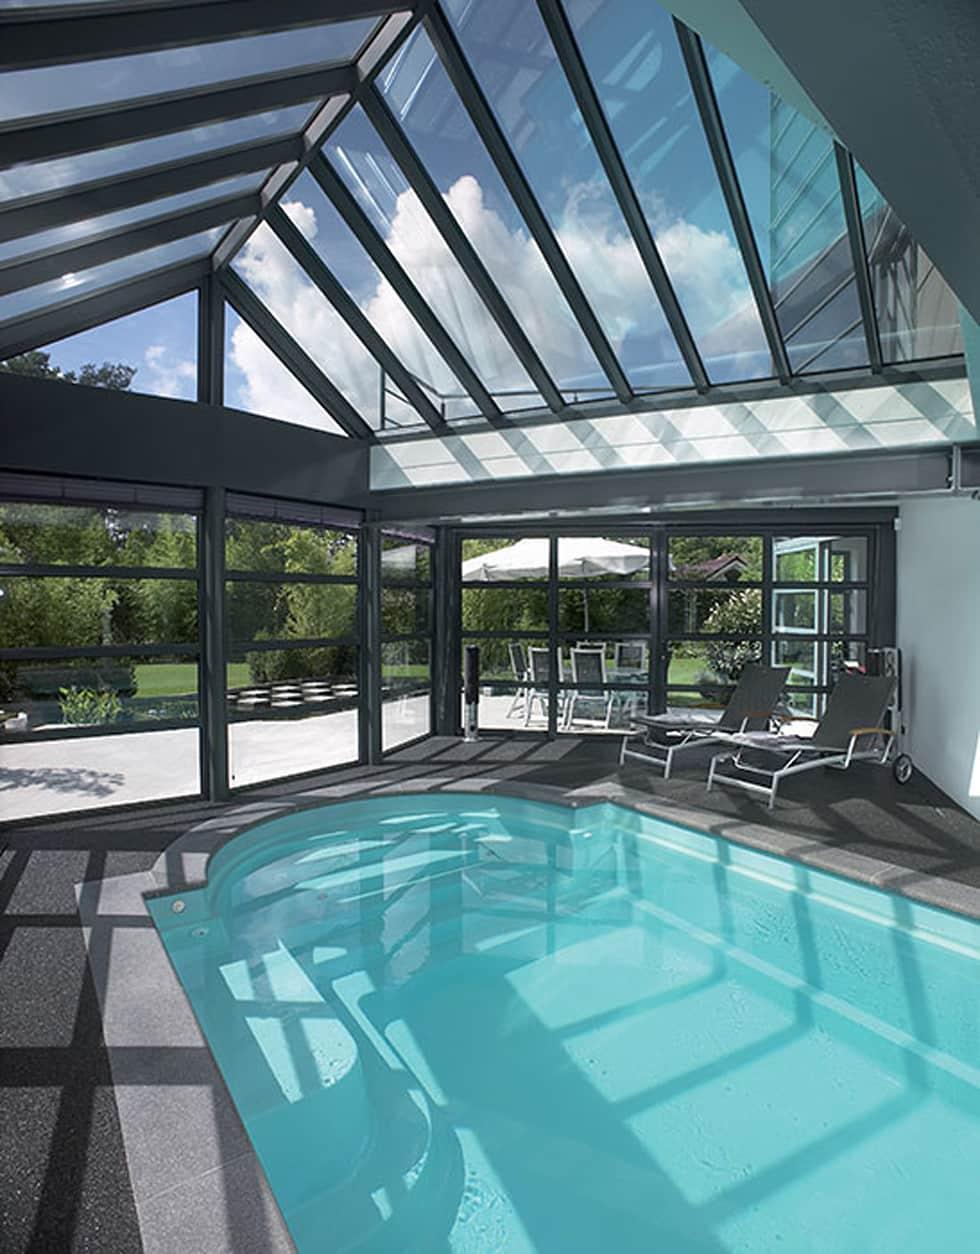 бассейн с зимним садом фото запах способен